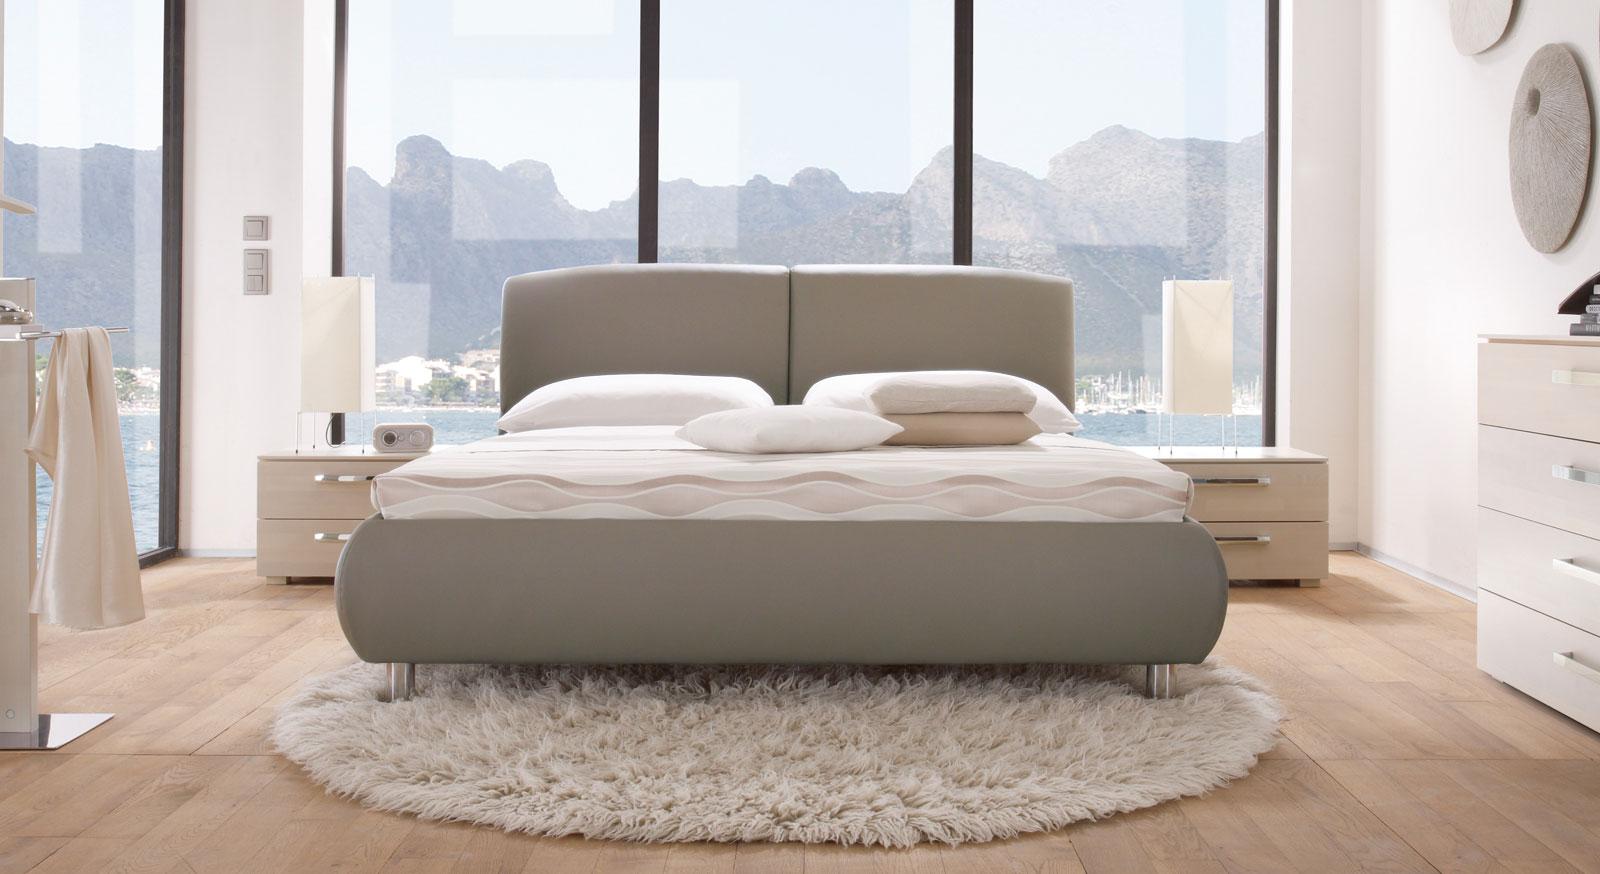 badezimmer latte macchiato raum und m beldesign inspiration. Black Bedroom Furniture Sets. Home Design Ideas